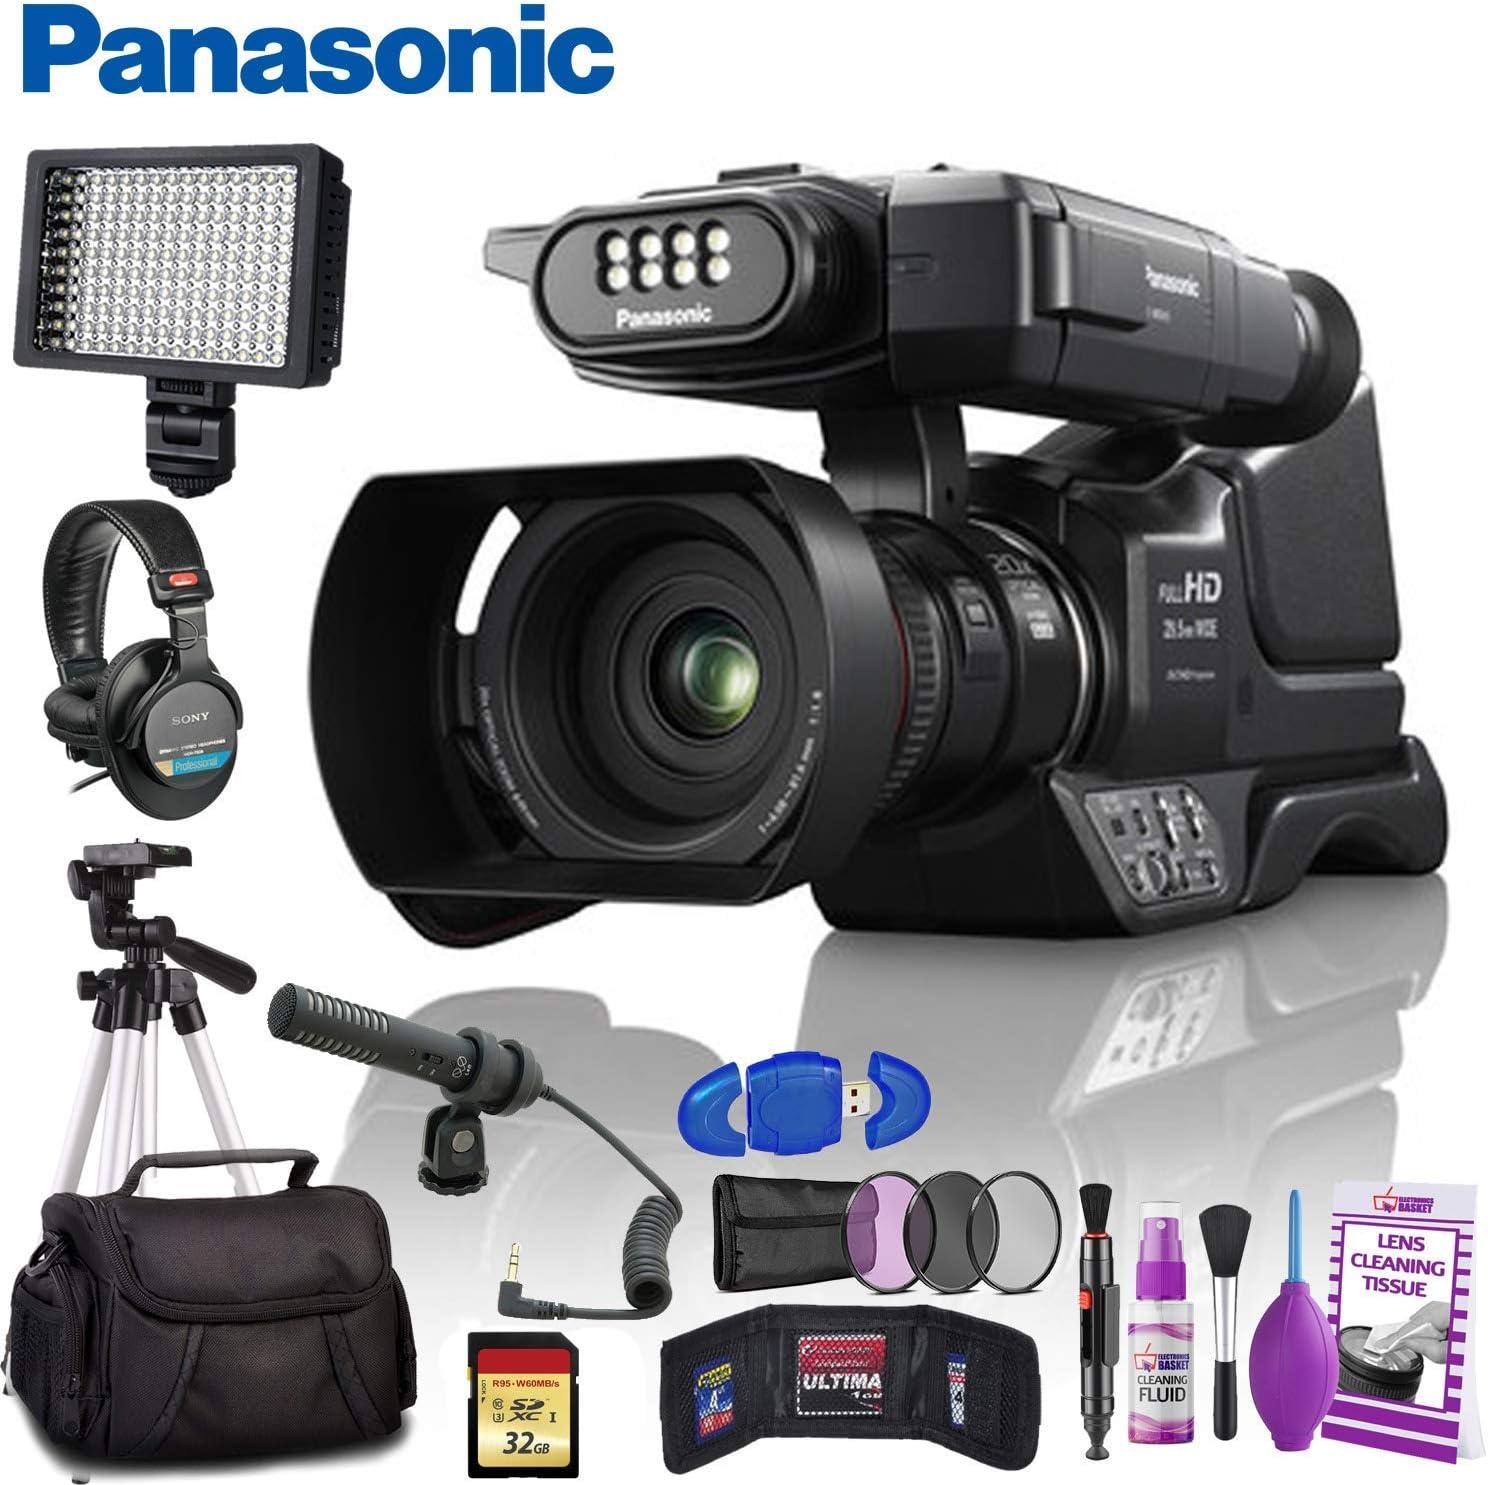 NEW before selling Panasonic HC-MDH3 AVCHD Shoulder Mount Kit Camcorder 1 year warranty - Platinum